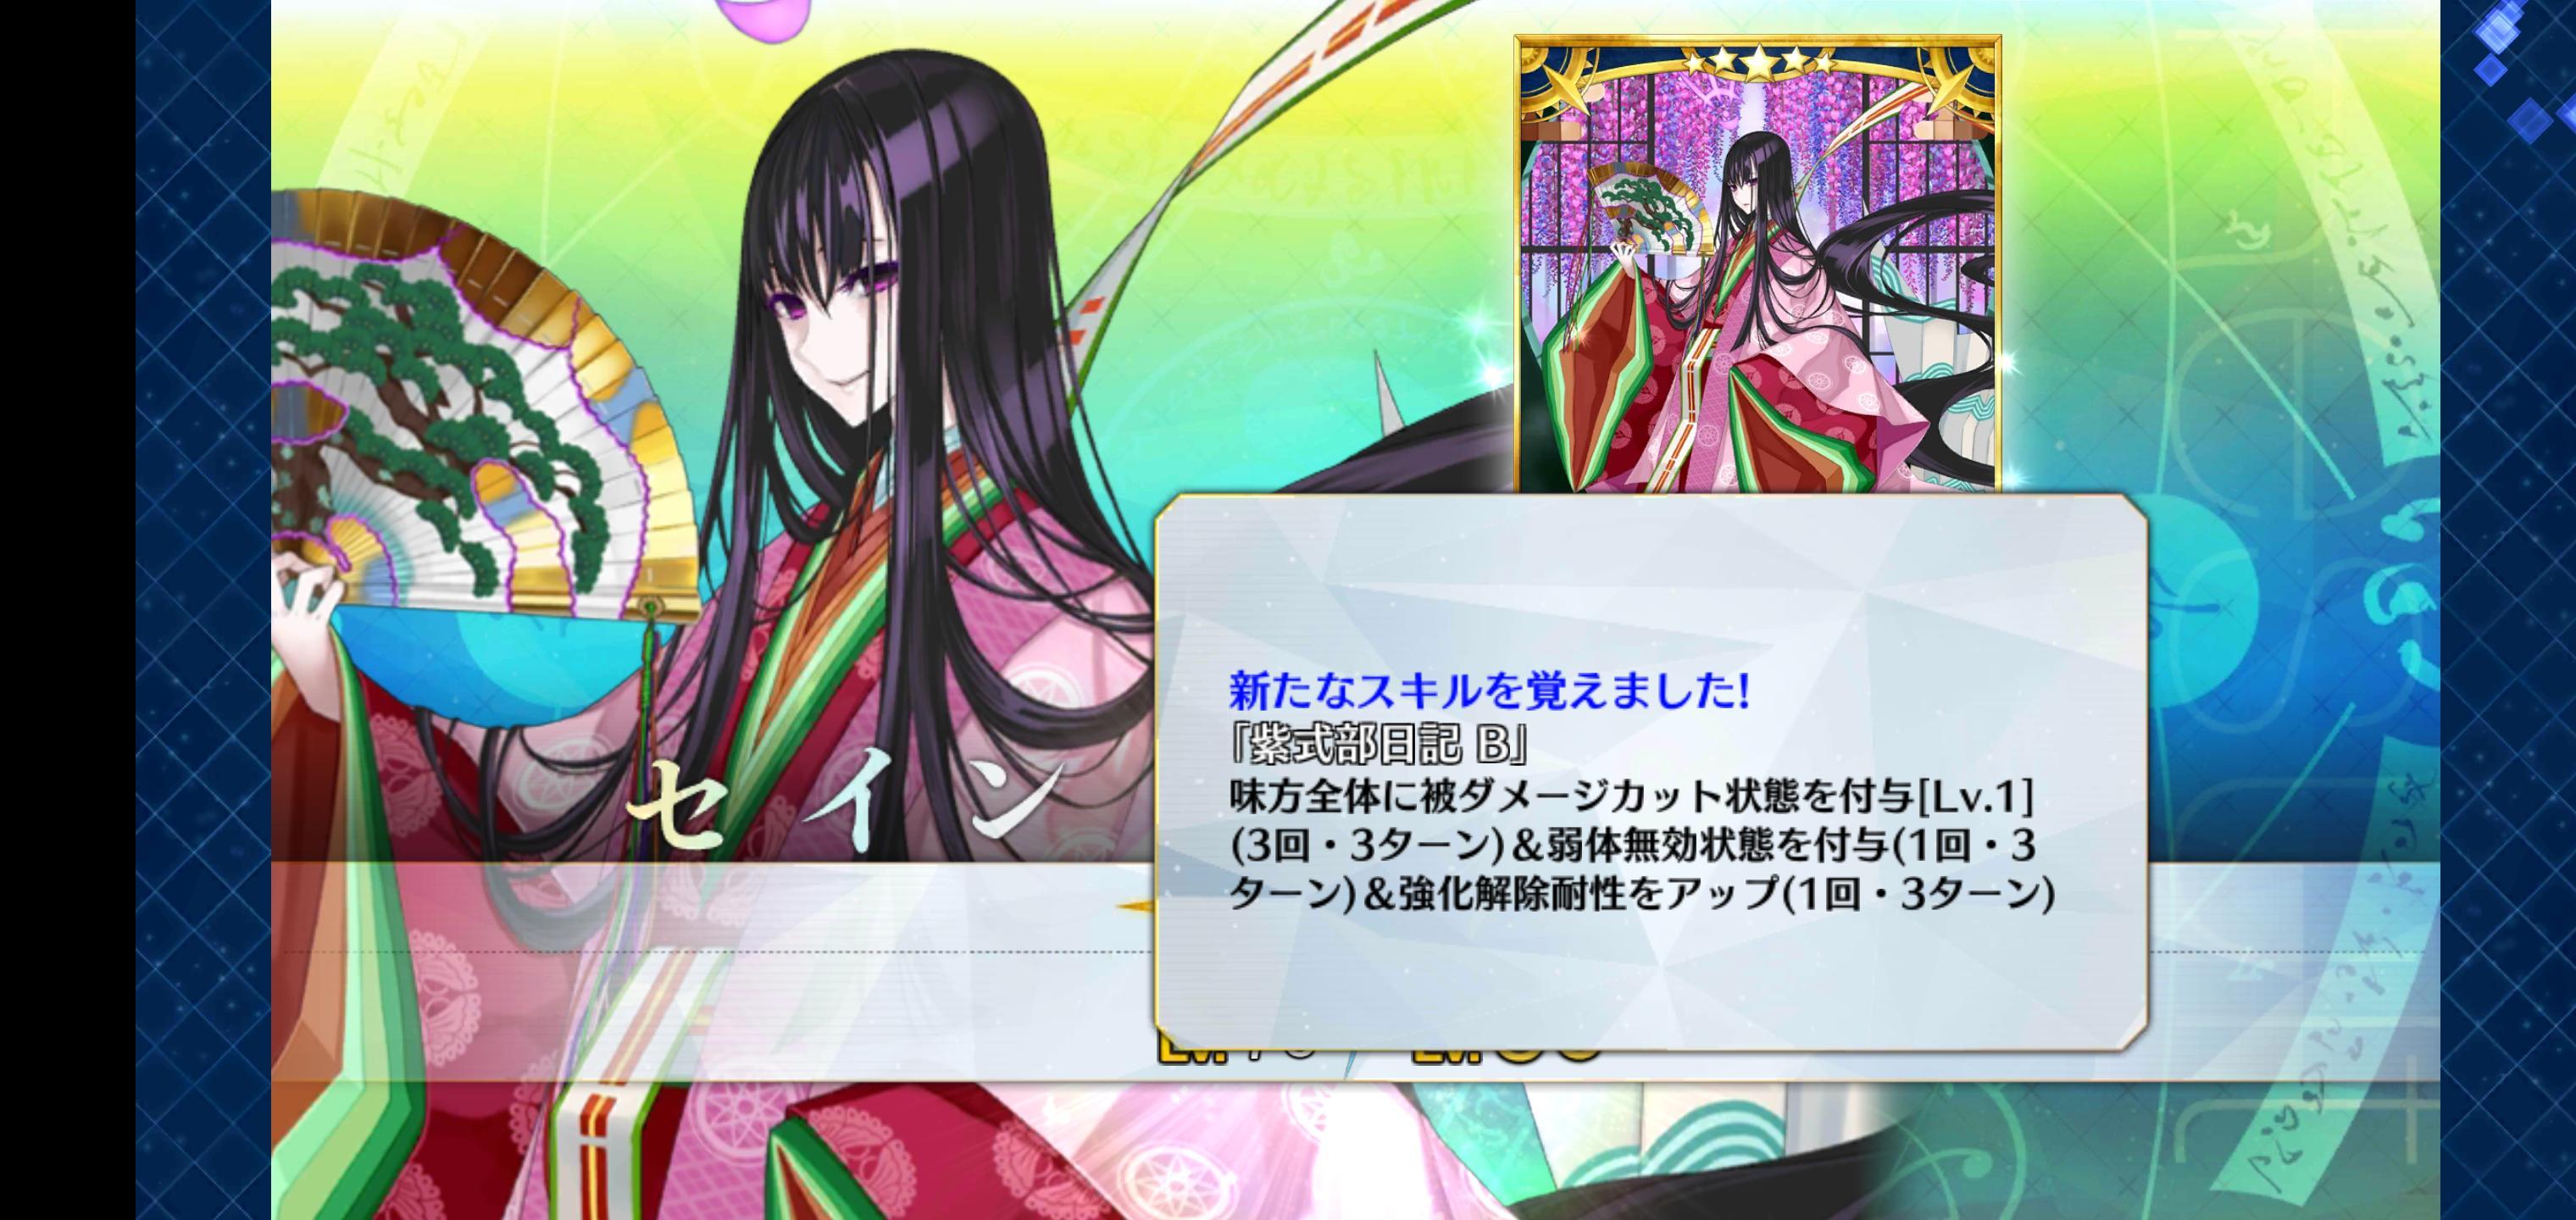 【FGO】紫式部の三臨のせいでかぐや姫出しづらくなっちゃったんじゃないの?